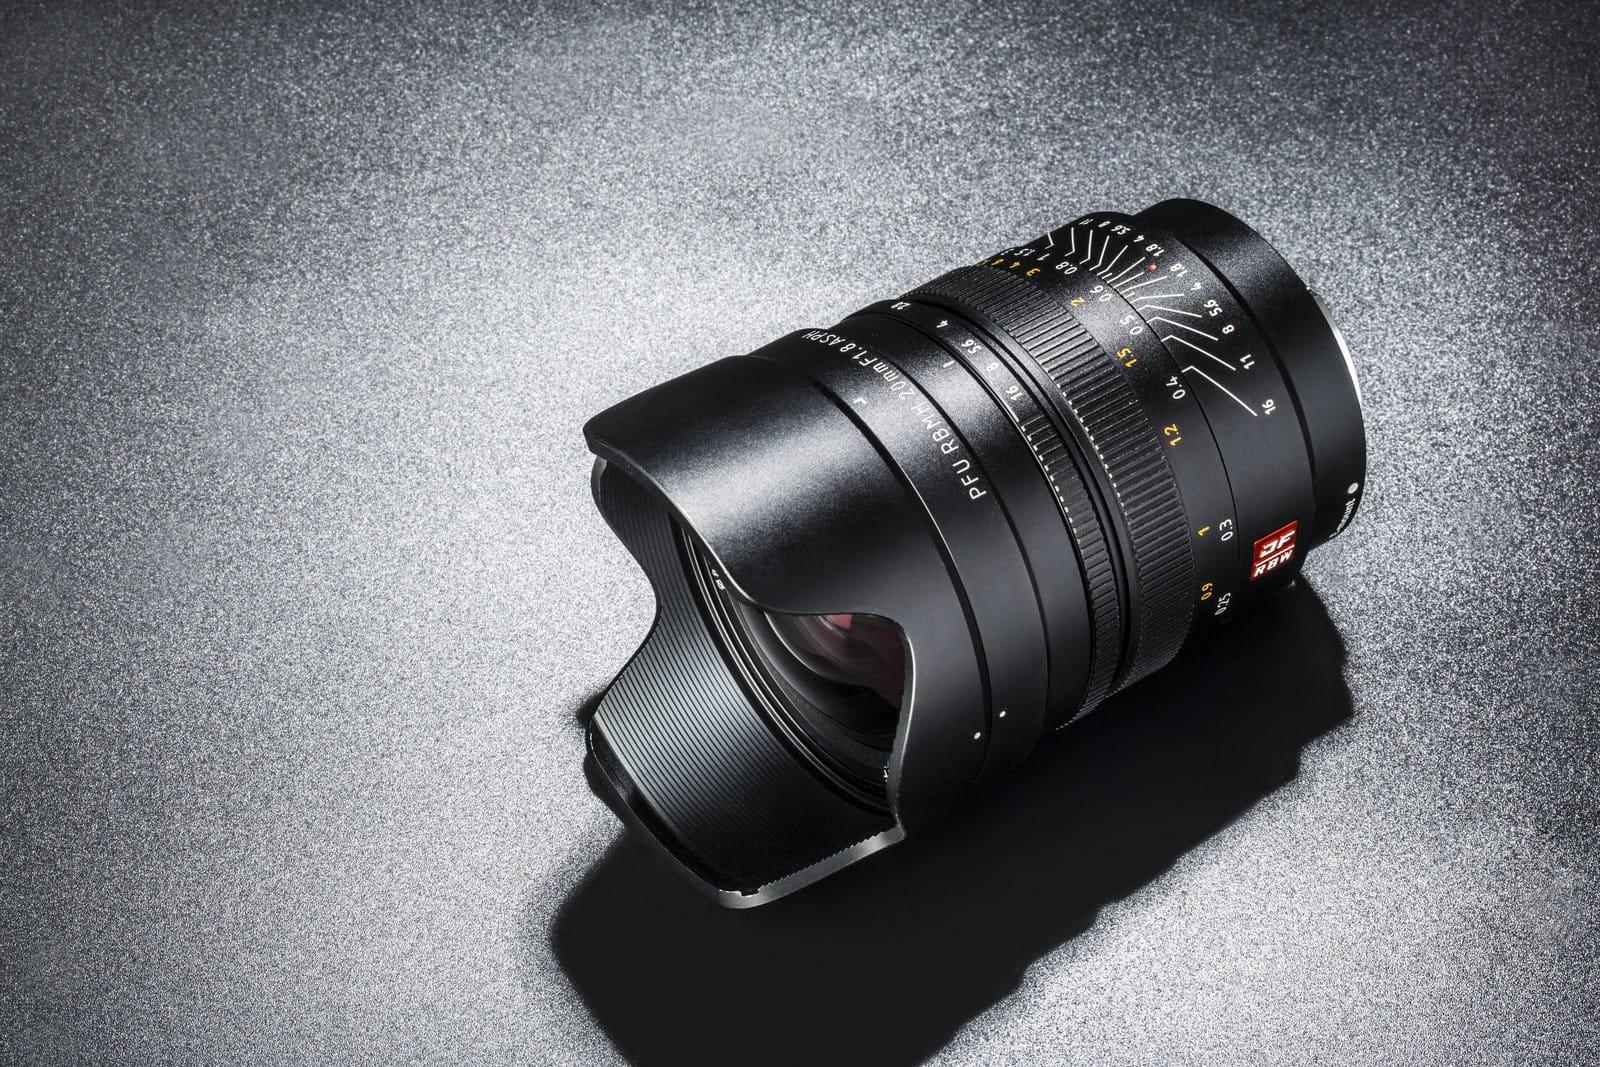 Viltrox FE 20mm f/1.8 Sony E